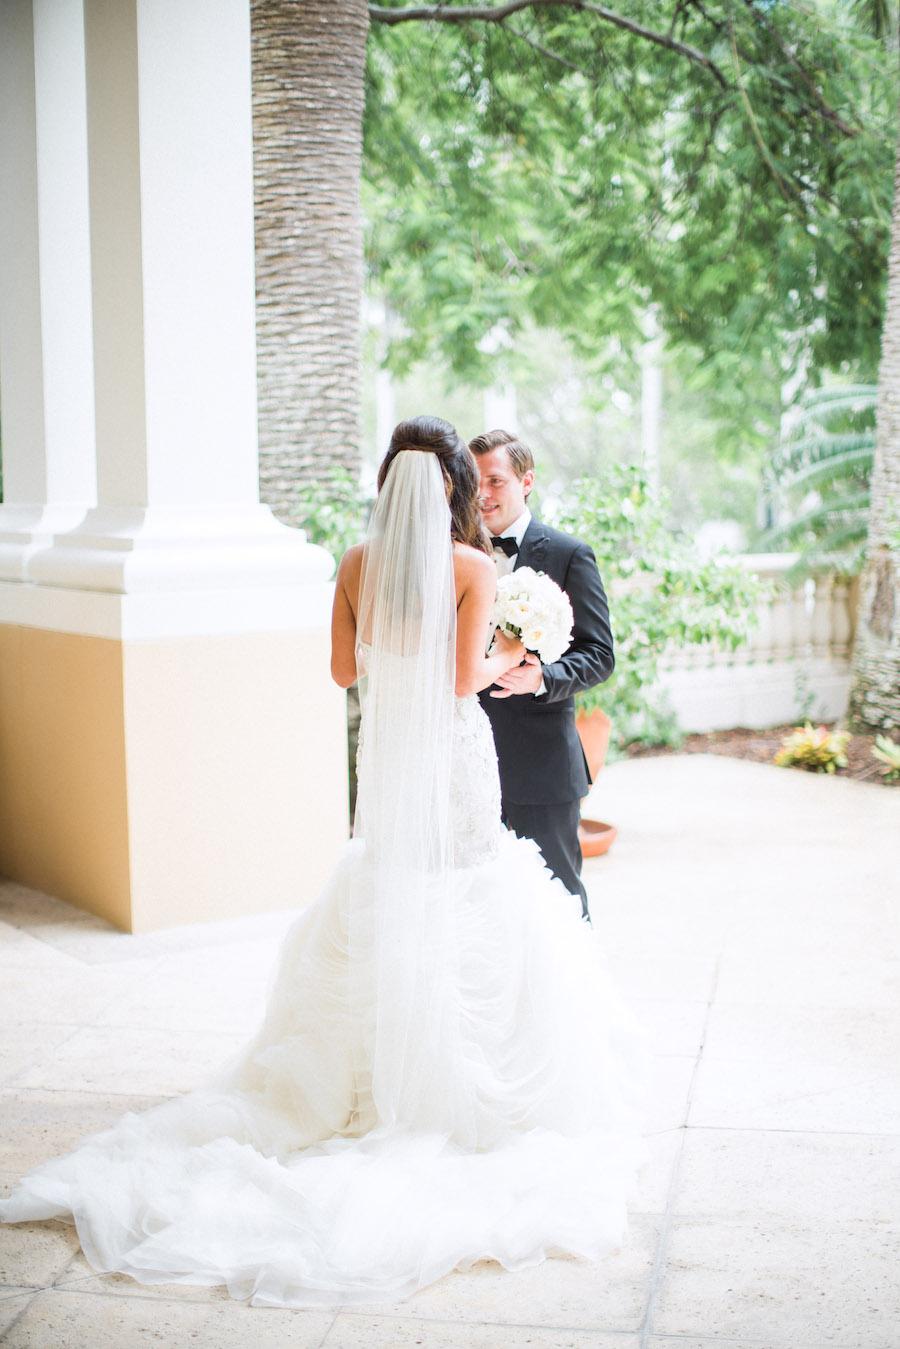 Sarasota Bride and Groom First Look Wedding Portrait